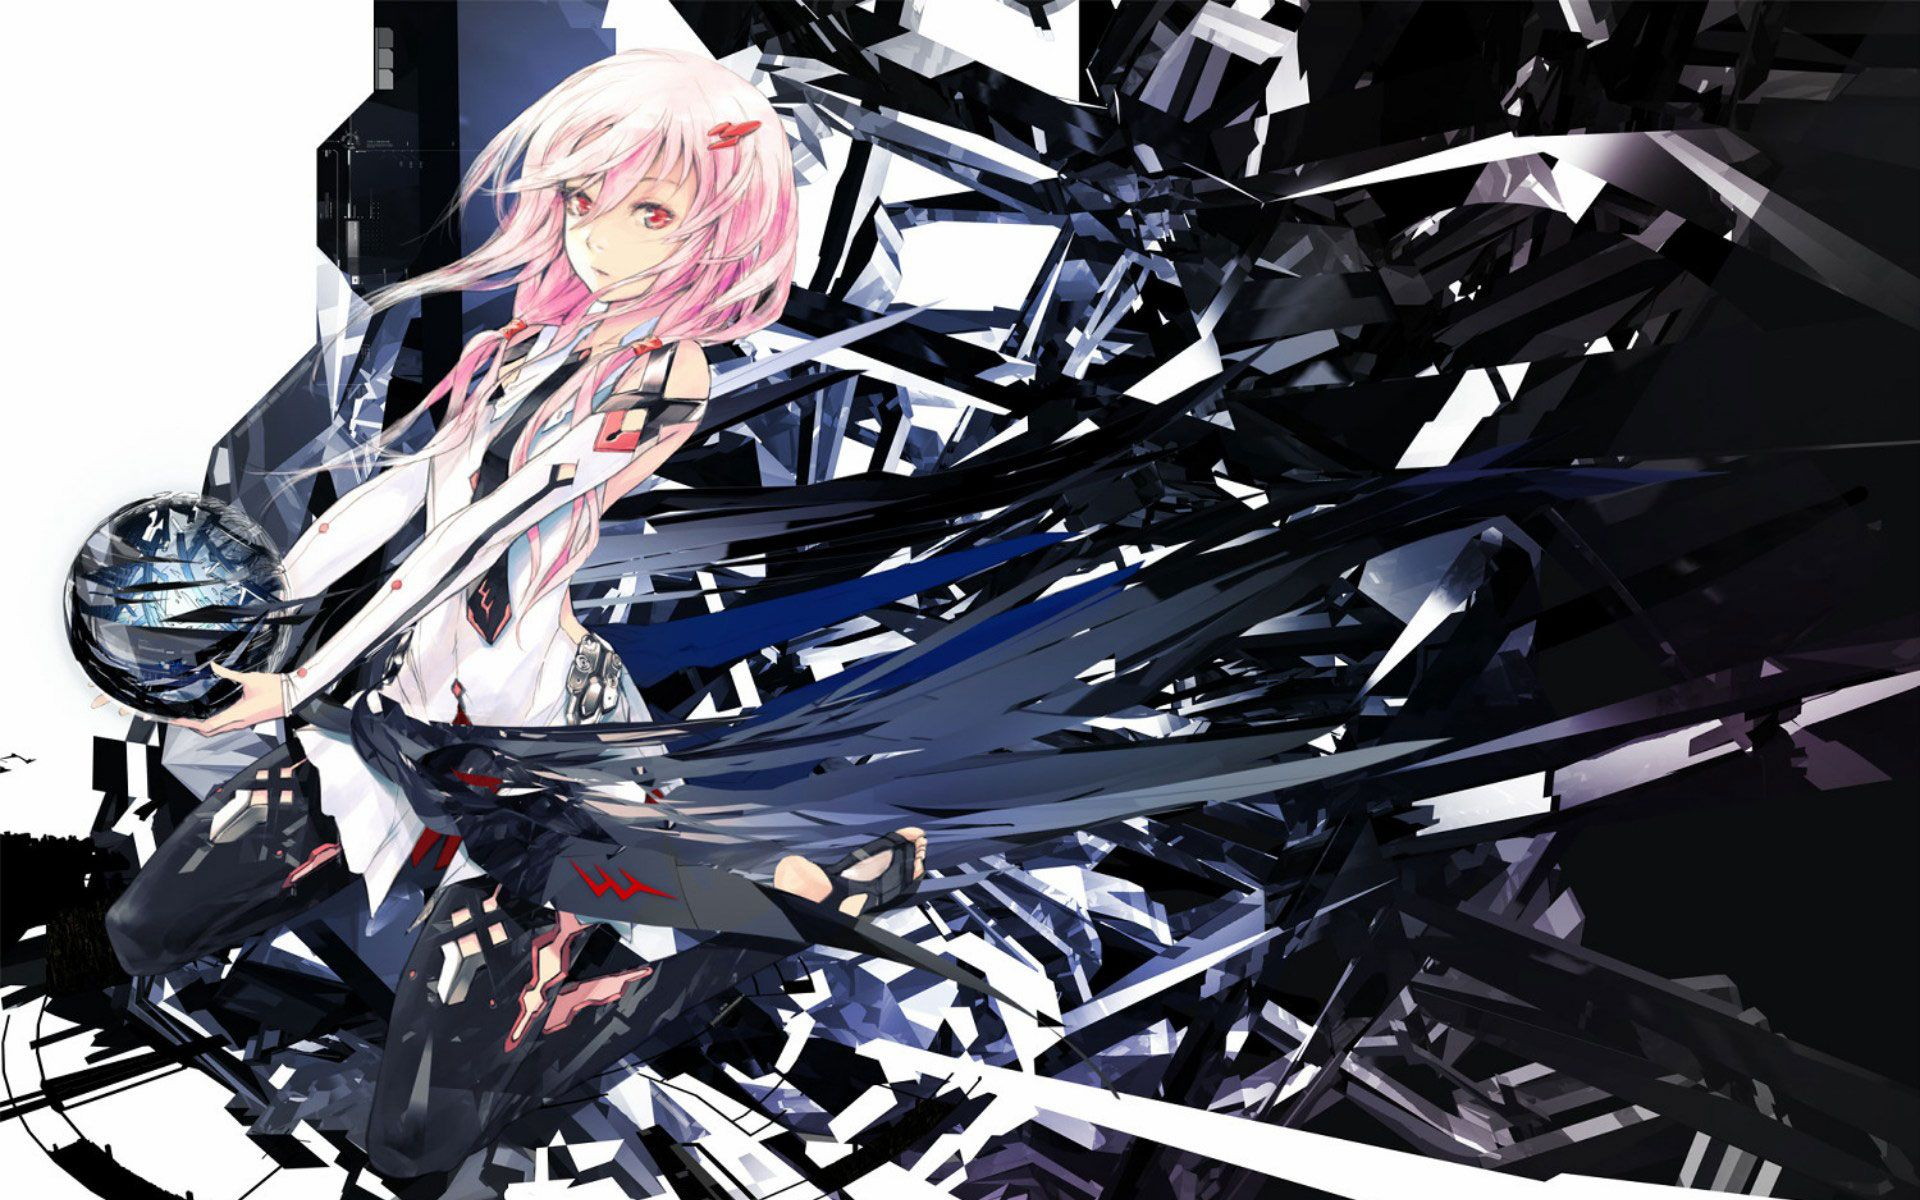 Guilty Crown Wallpaper Hd Anime Wallpaper Inori Yuzuriha Anime Canvas